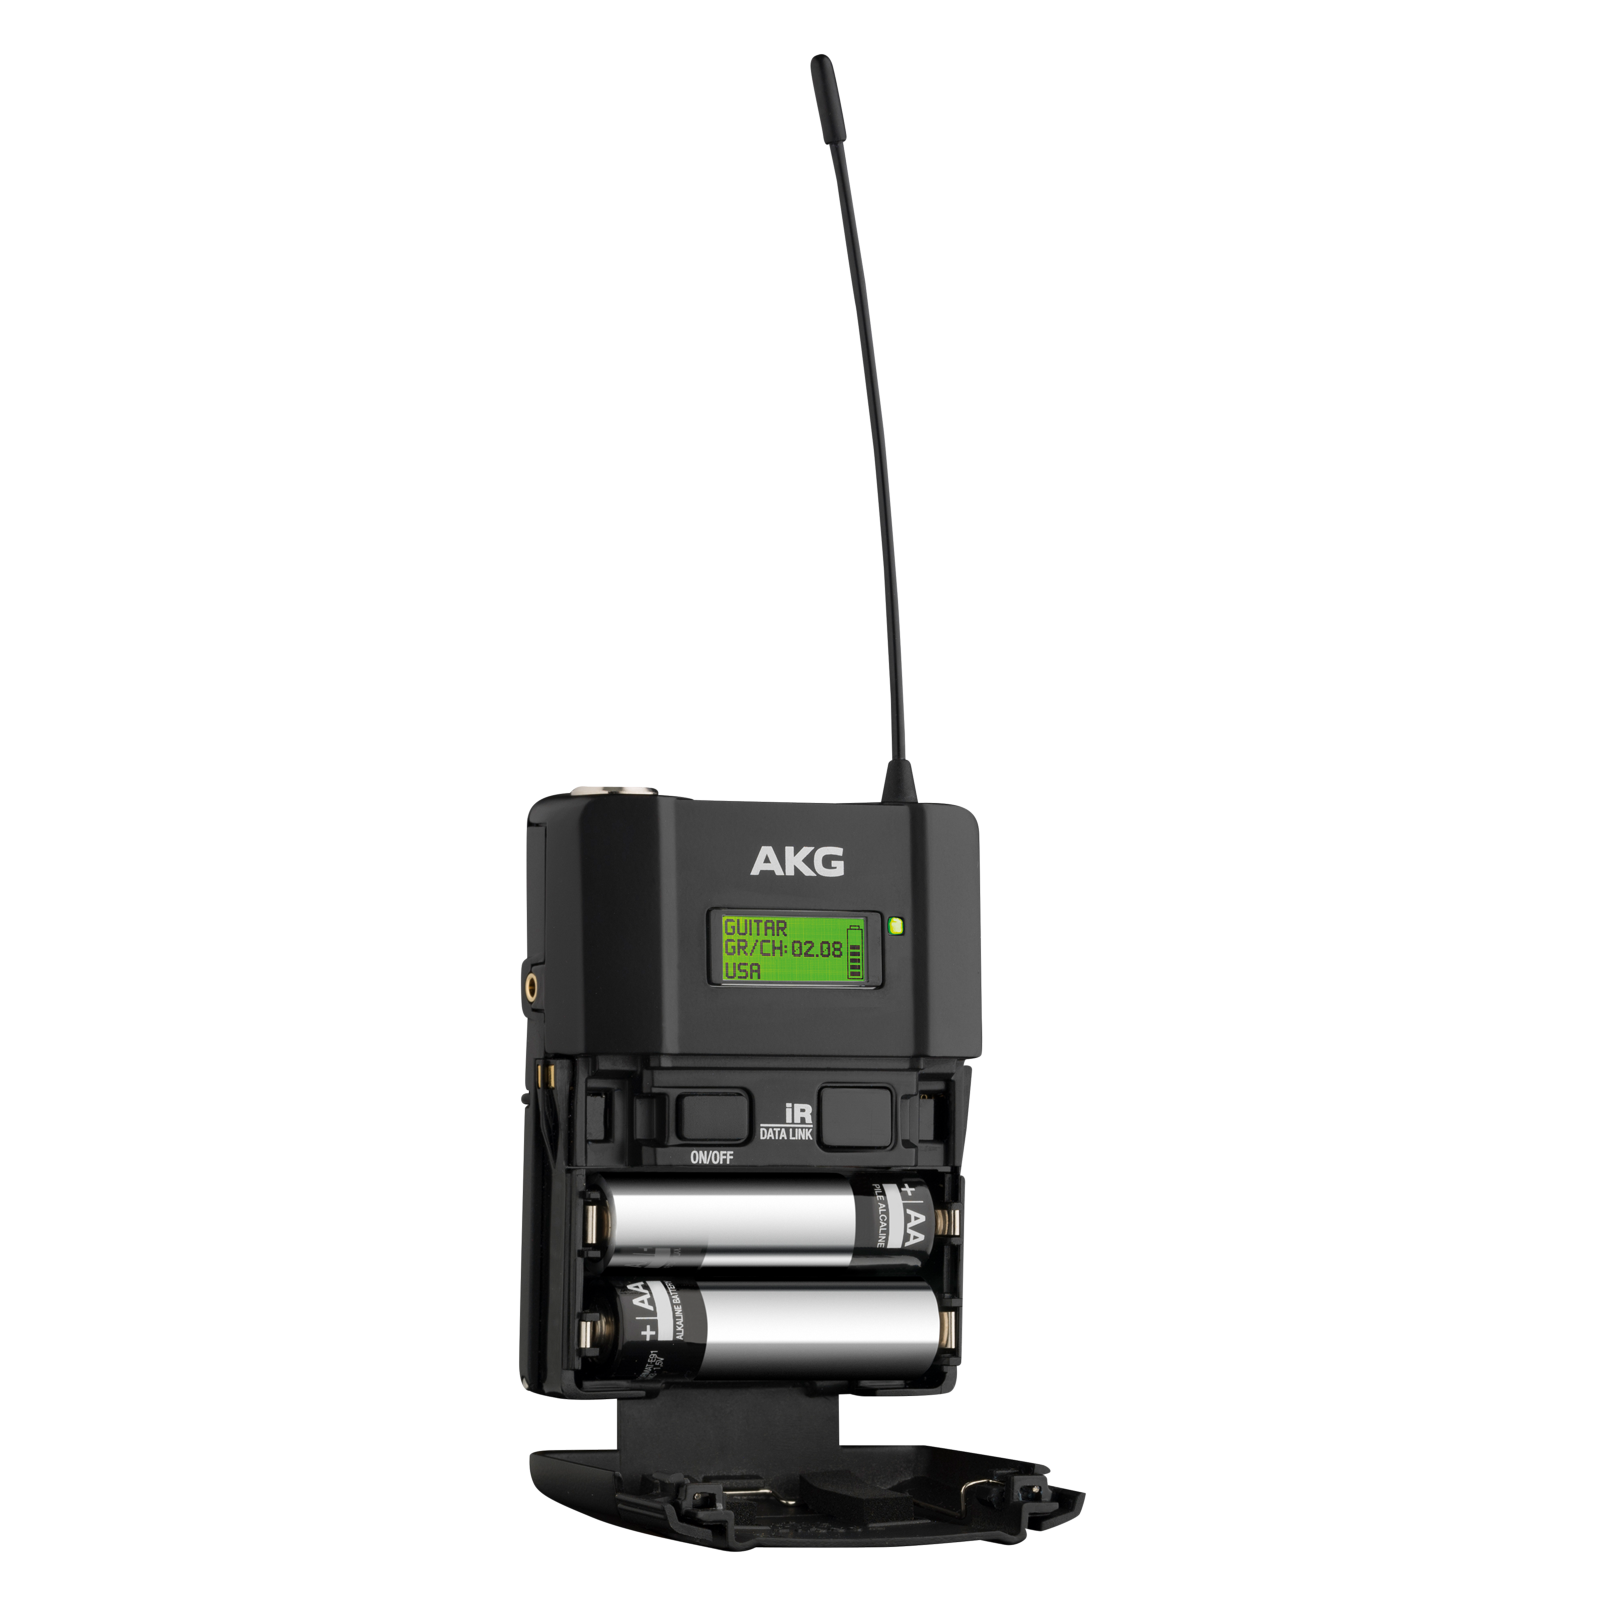 DPT800 Band1 50mW - Black - Reference digital wireless body pack transmitter - Detailshot 1